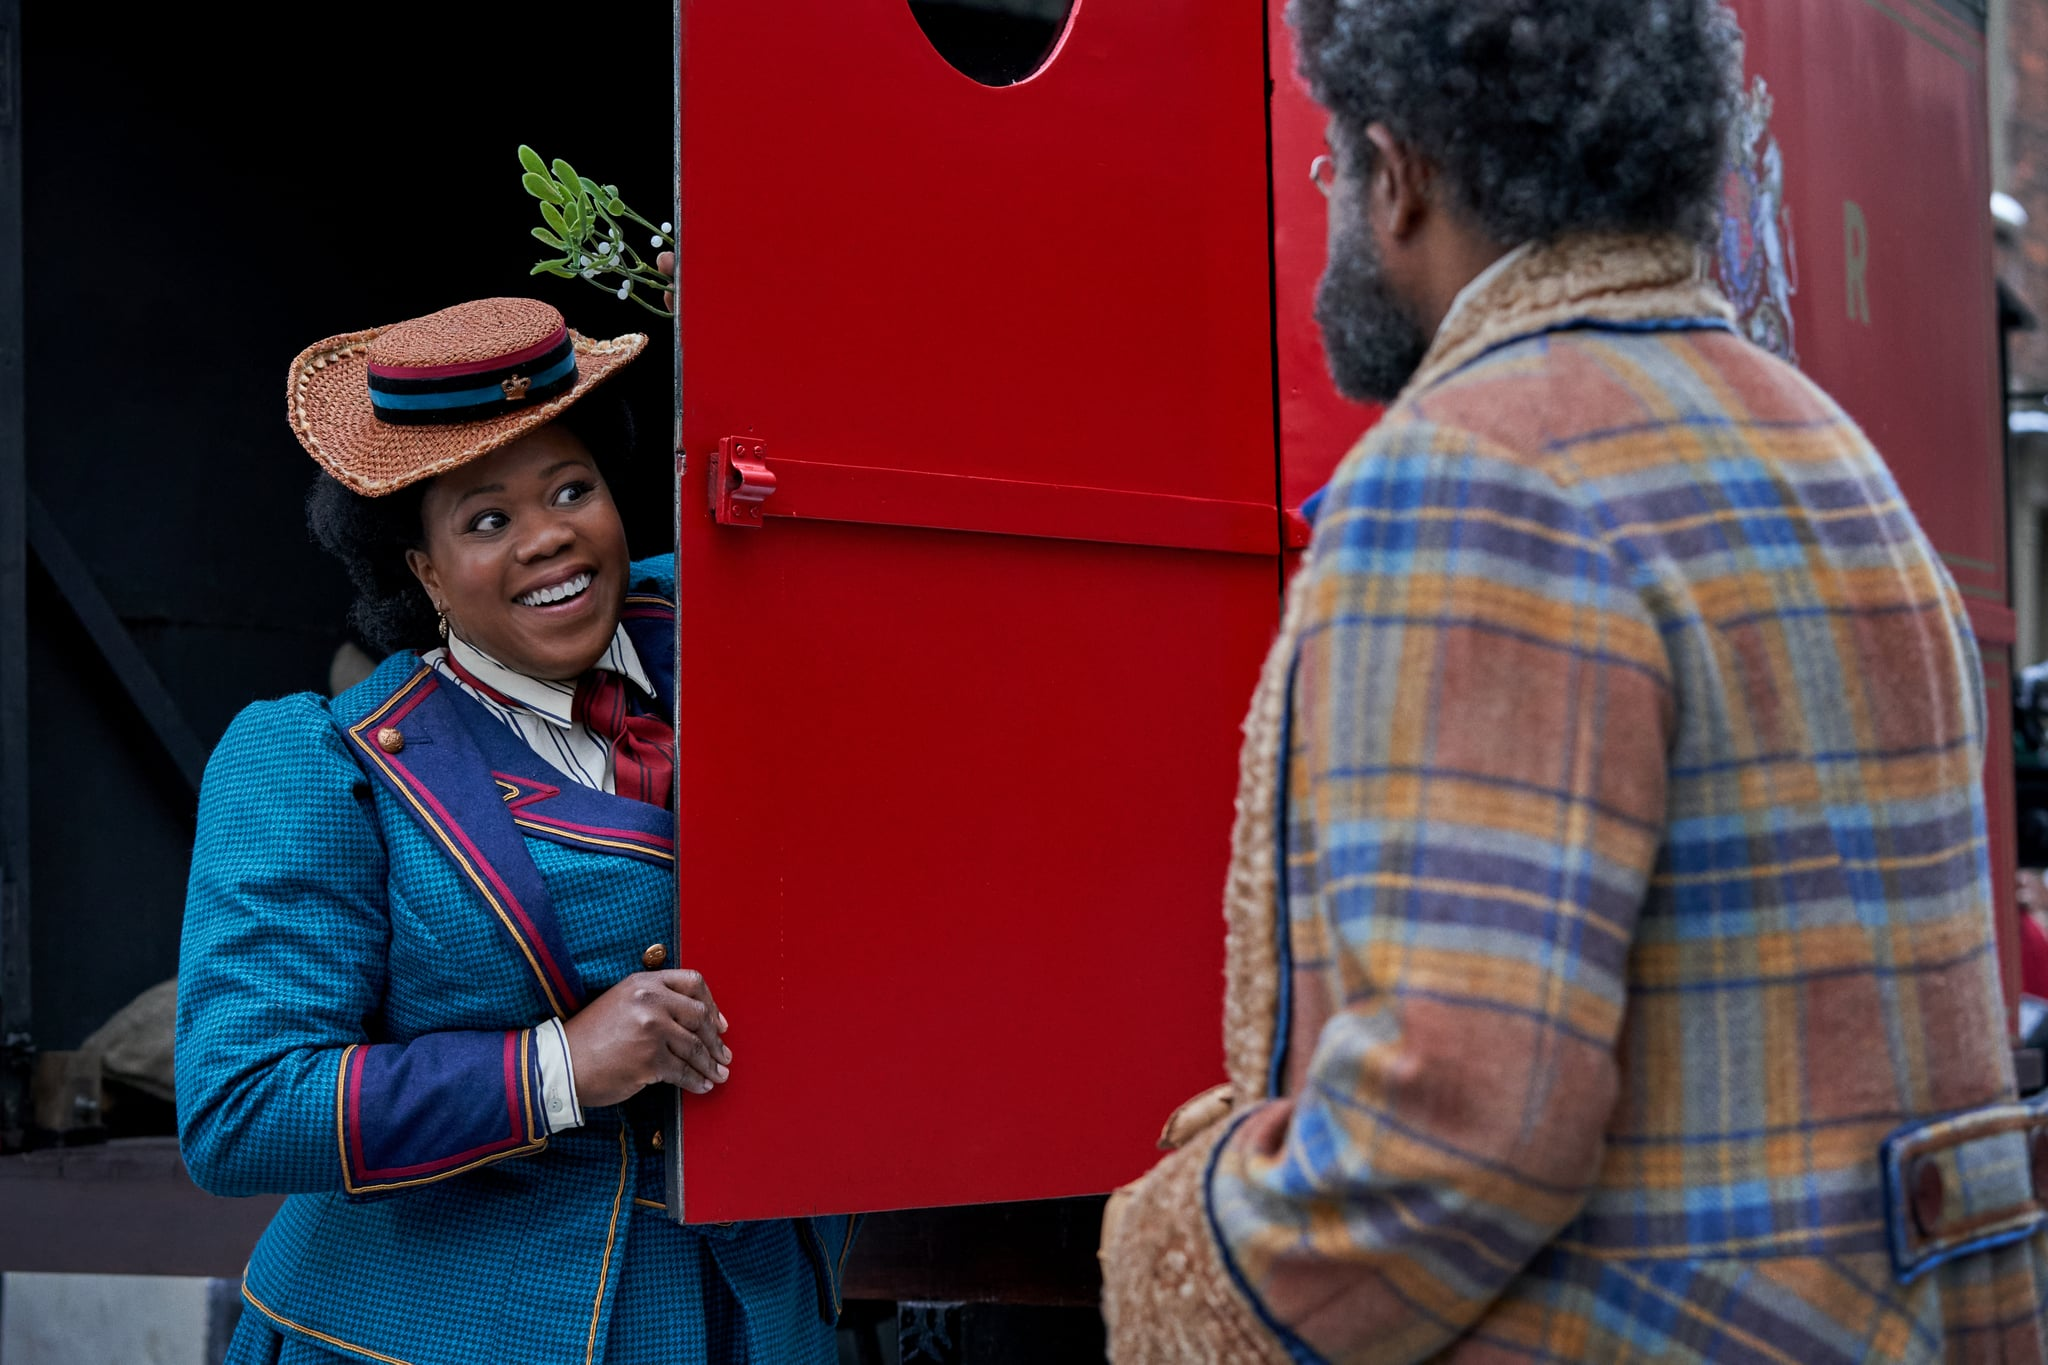 JINGLE JANGLE: A CHRISTMAS JOURNEY (2020) Lisa Davina Phillip as Ms. Johnston and Forest Whitaker as Jeronicus Jangle.  Cr. Gareth Gatrell/NETFLIX